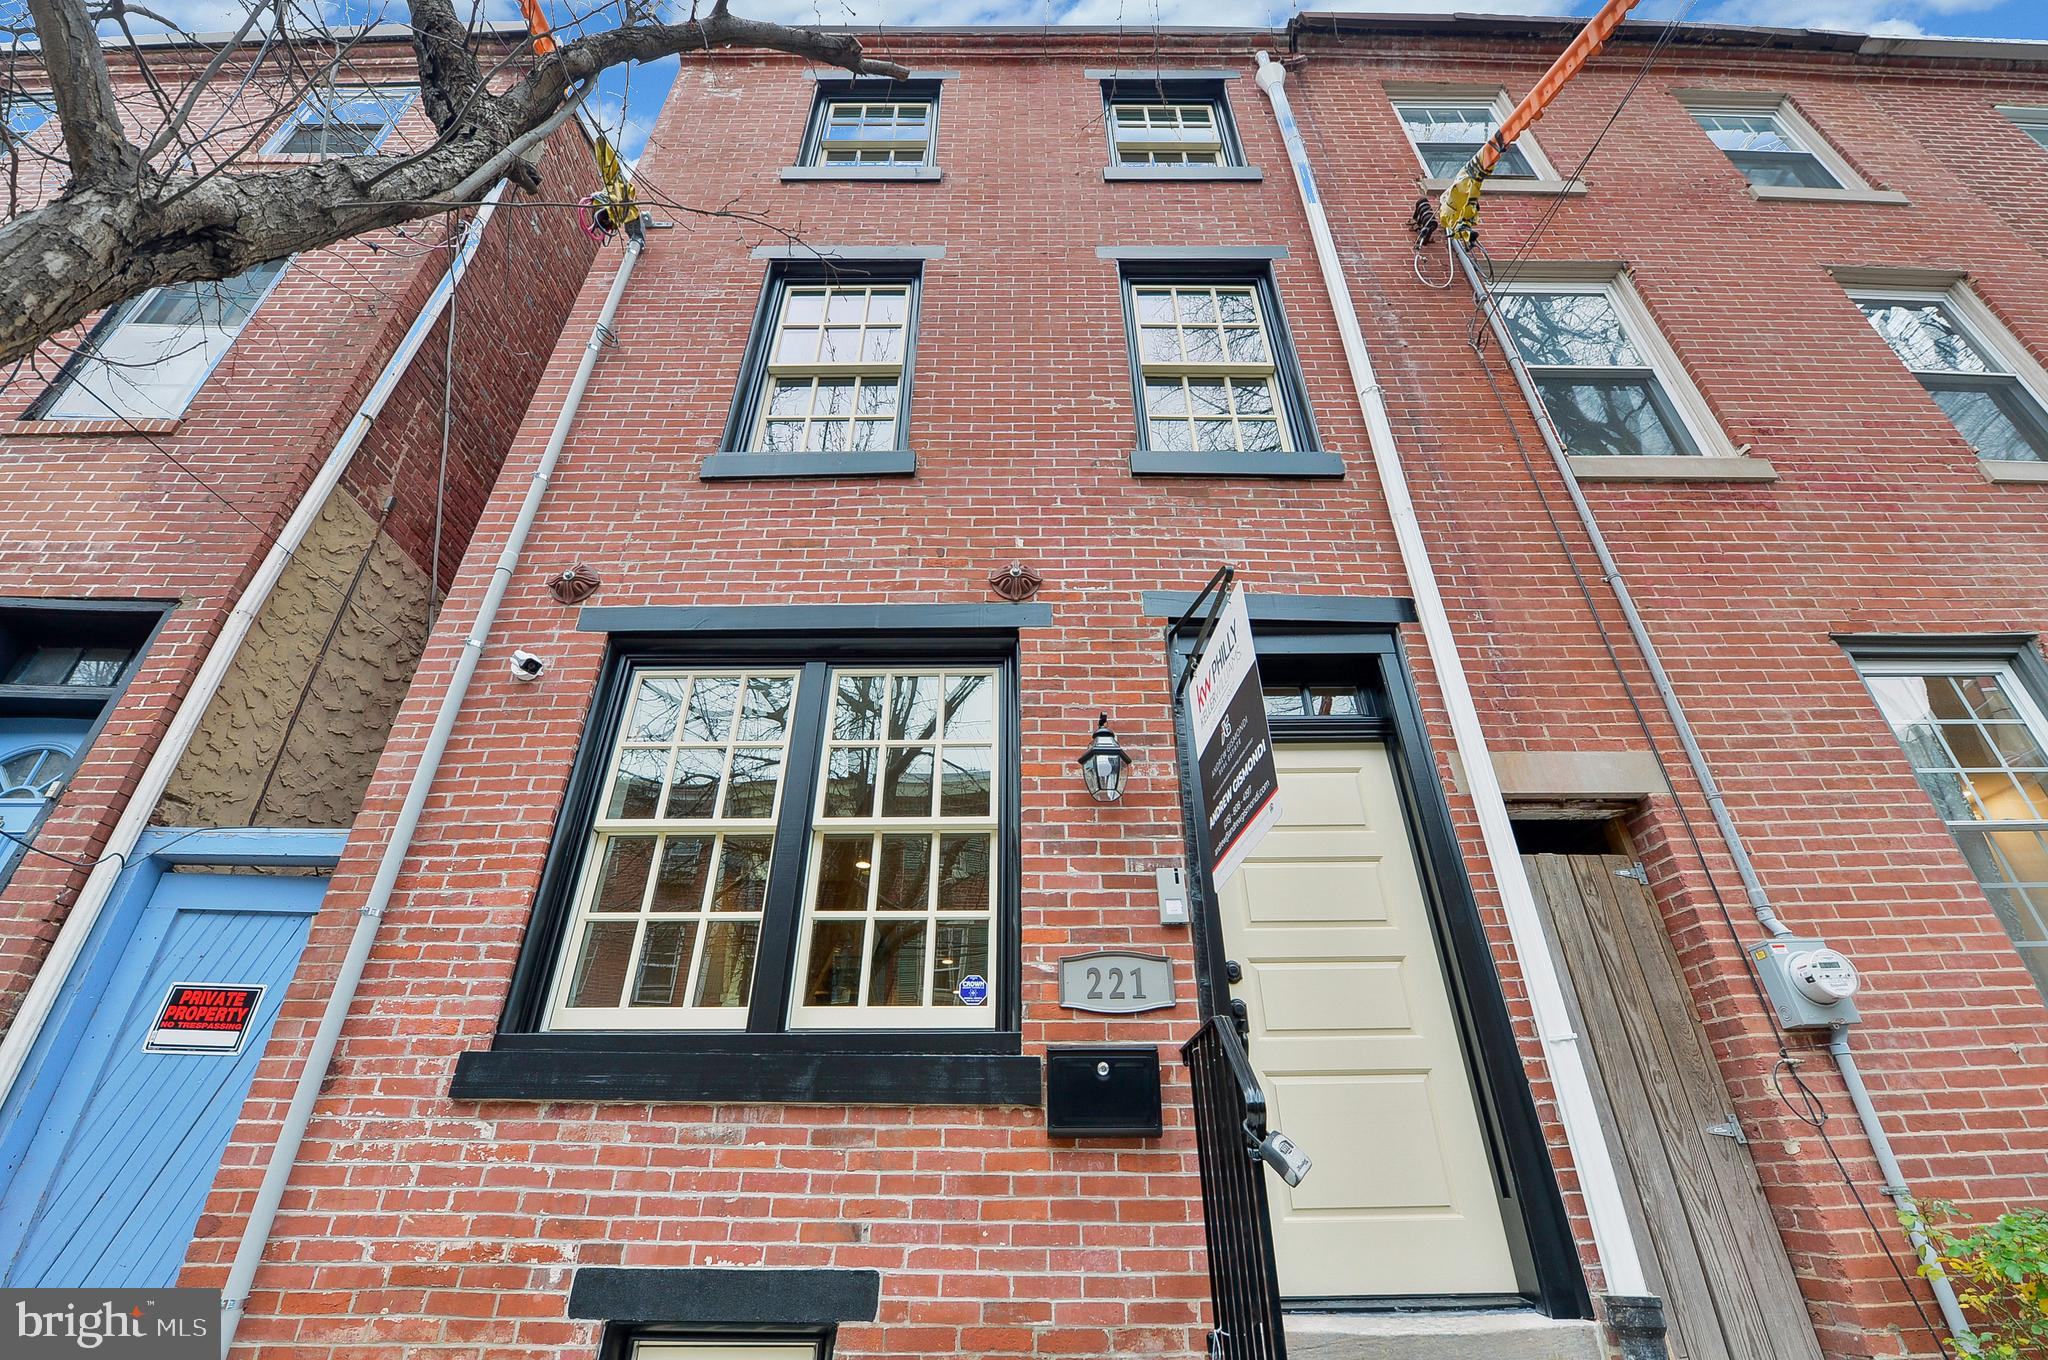 221 Montrose St, Philadelphia, PA, 19147